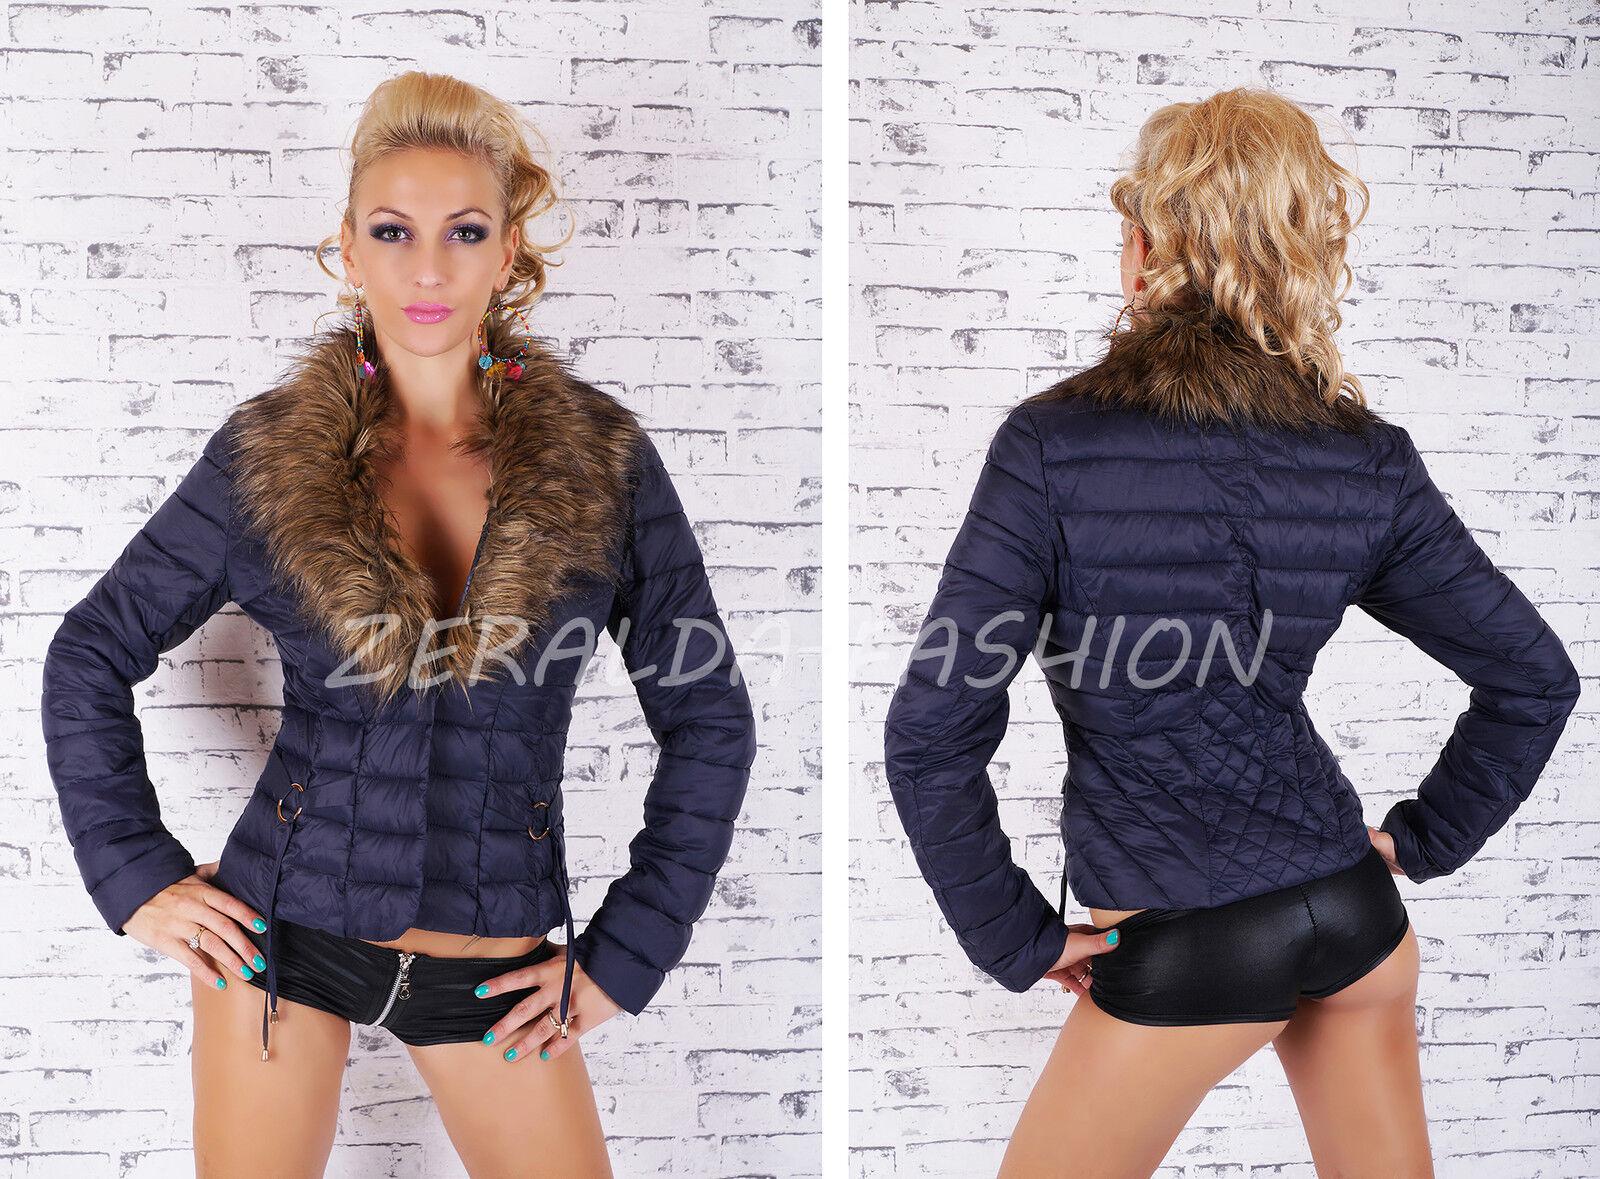 Sexy women Chaqueta Chaqueta Chaqueta Acolchada Ligero de Entretiempo Vellón S M L XL 10642b